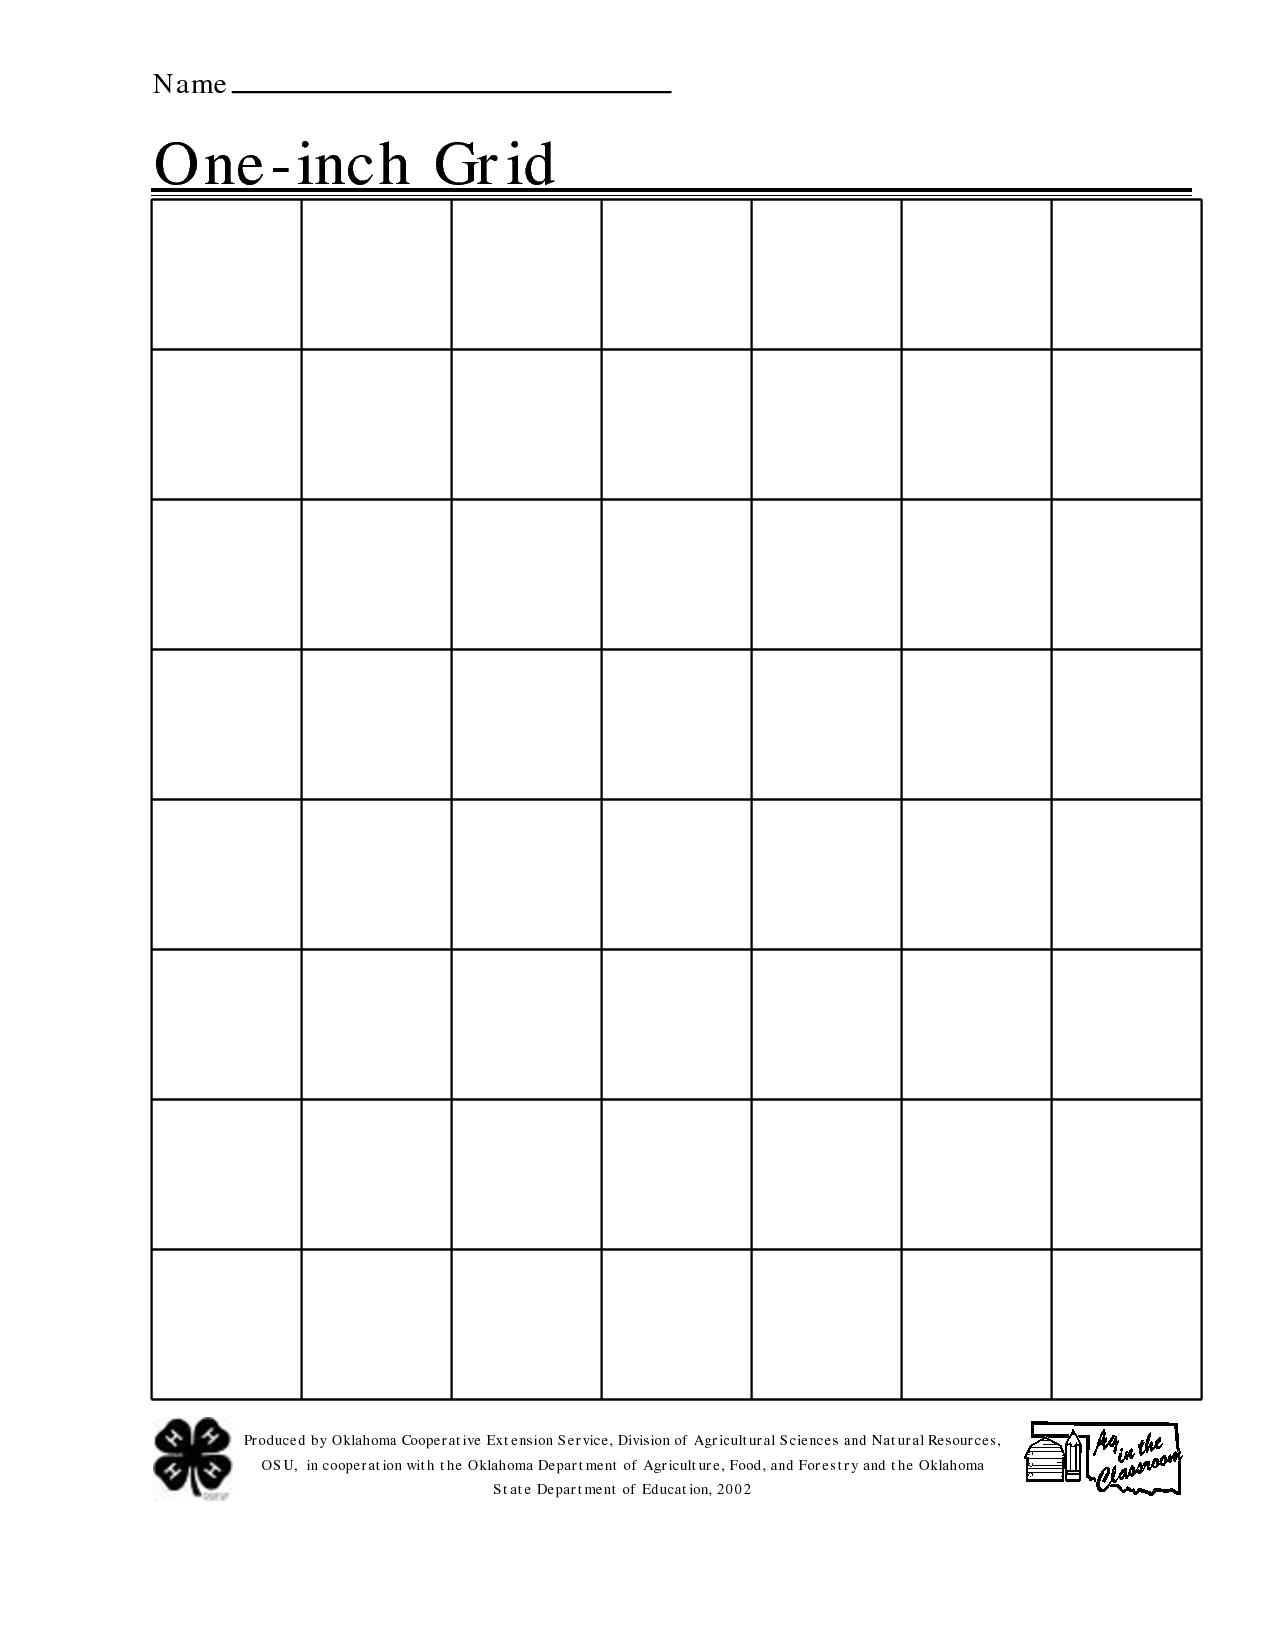 Free Printable 1 Inch Grid Paper   Math   Pinterest   Printable - Half Inch Grid Paper Free Printable